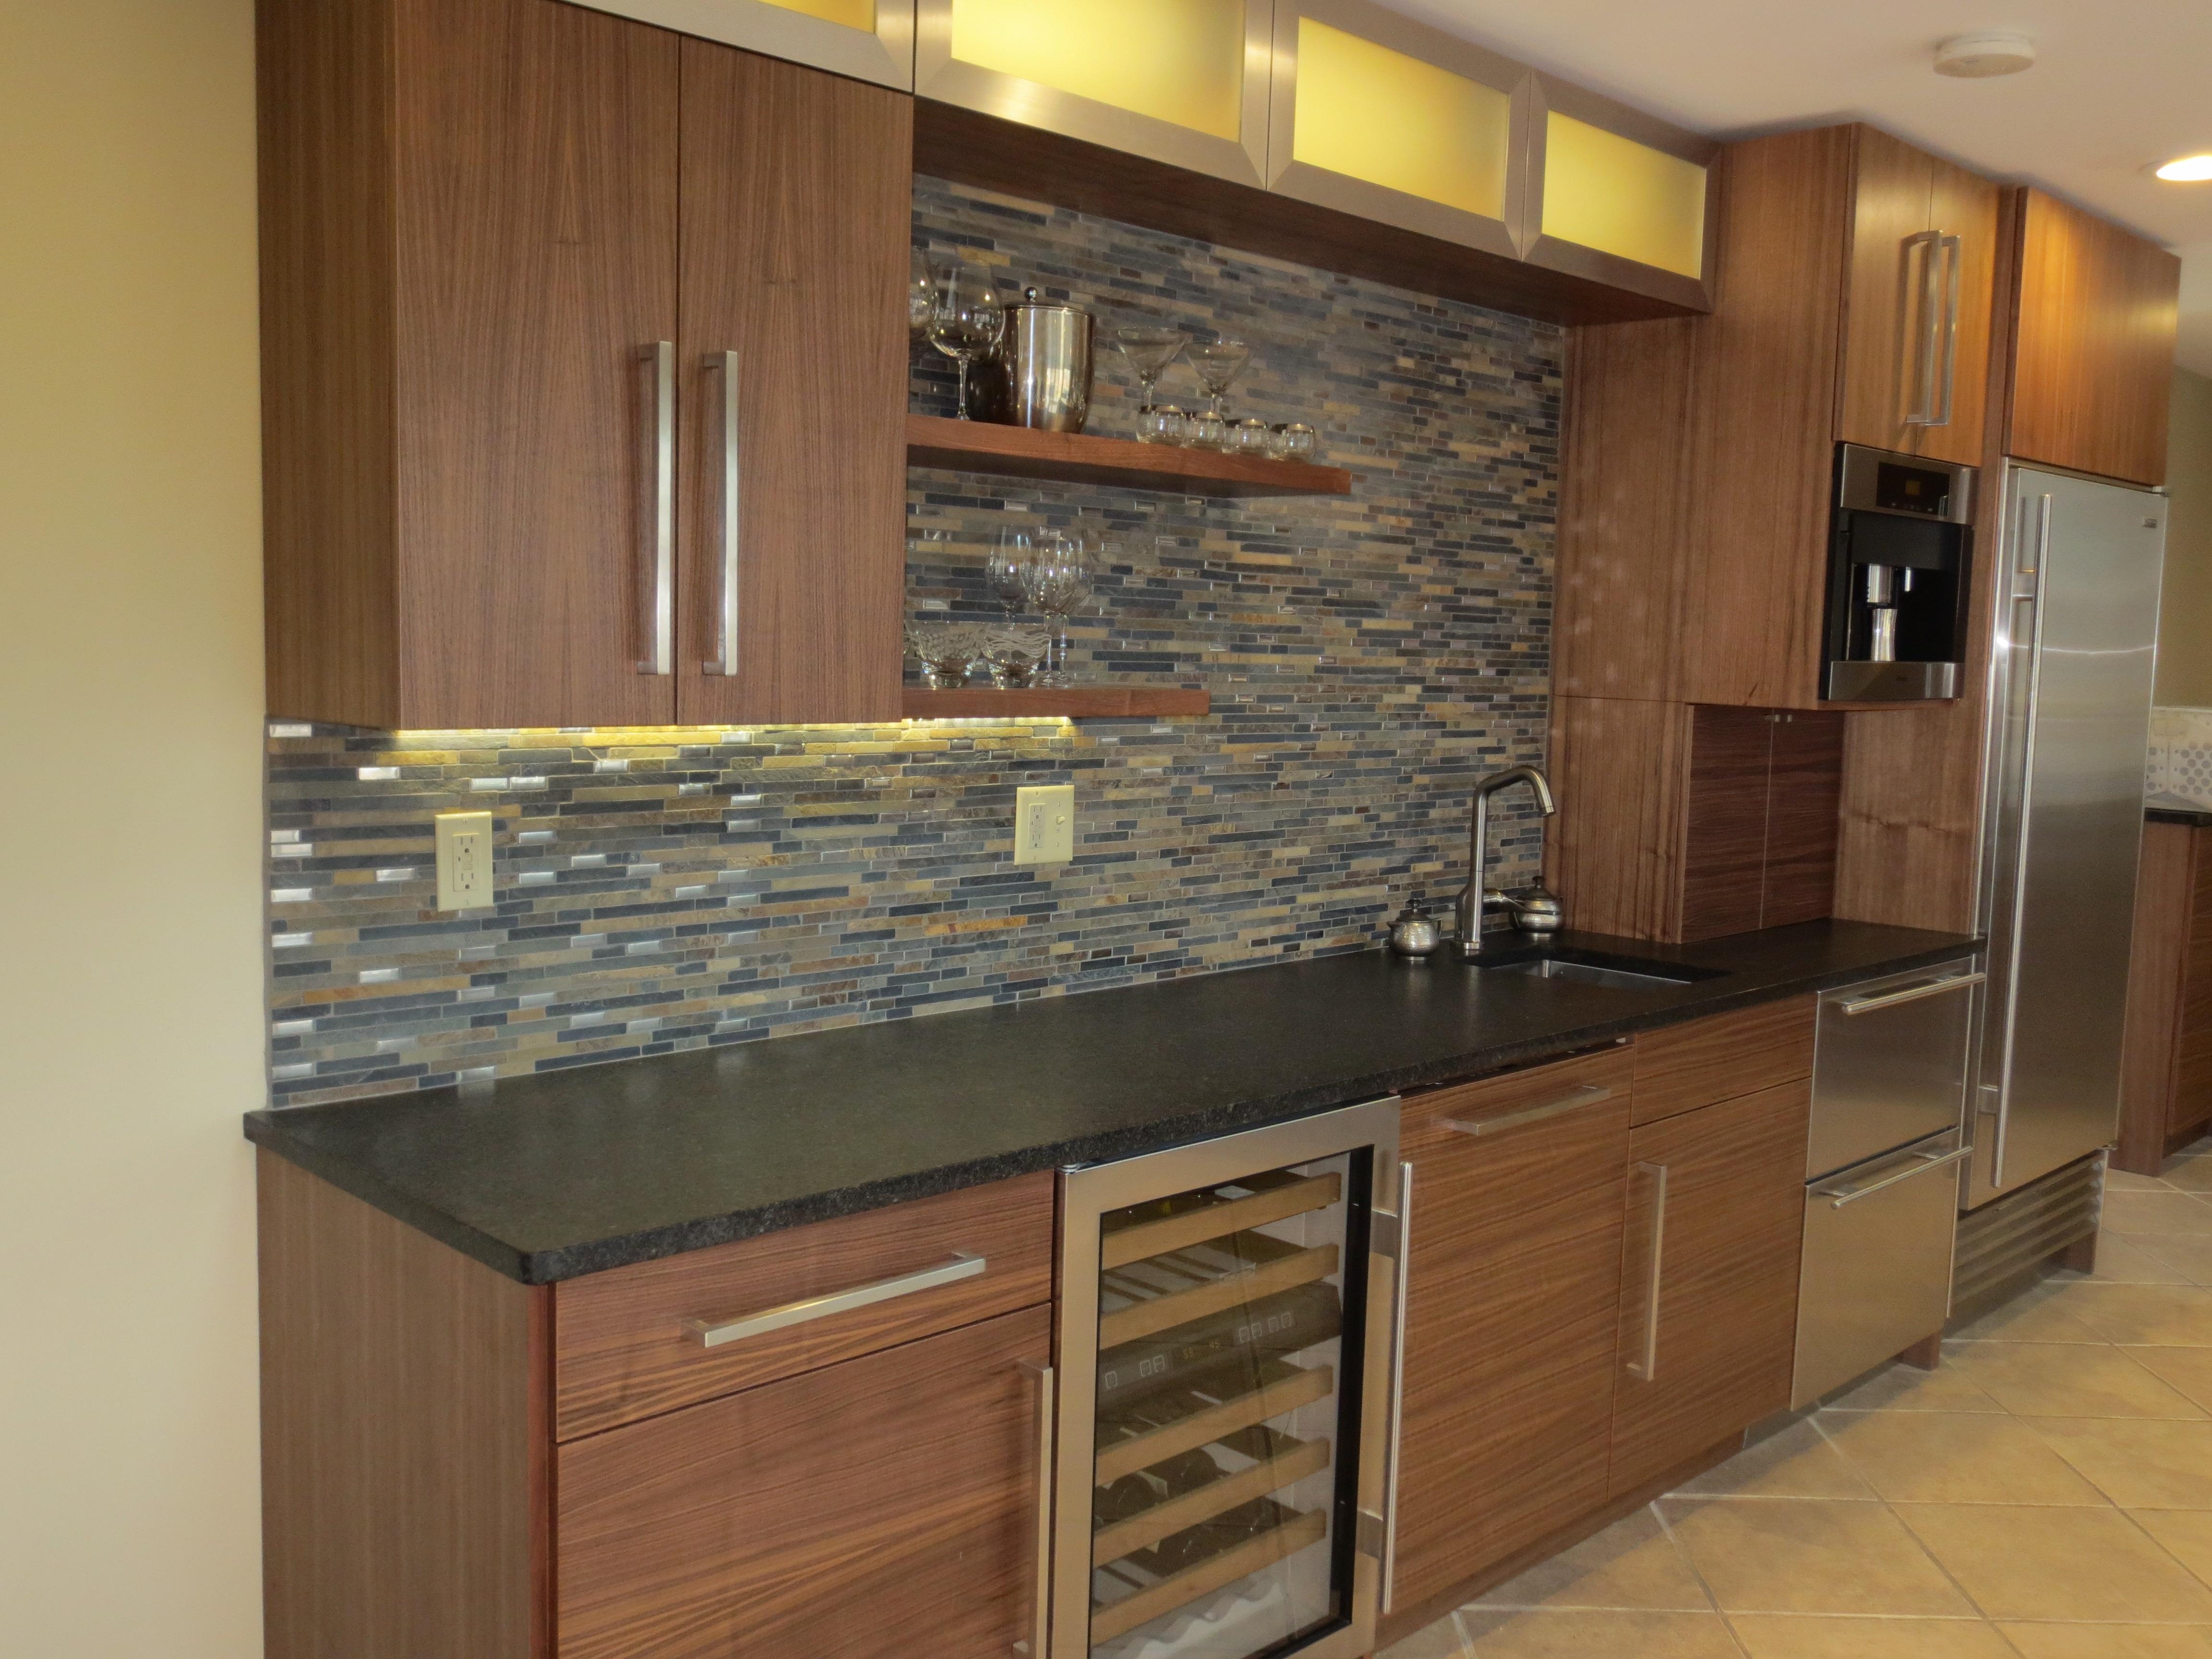 Modern Walnut Aluminum Glass Regarding Glass Shelves For Bar Area (Image 11 of 15)